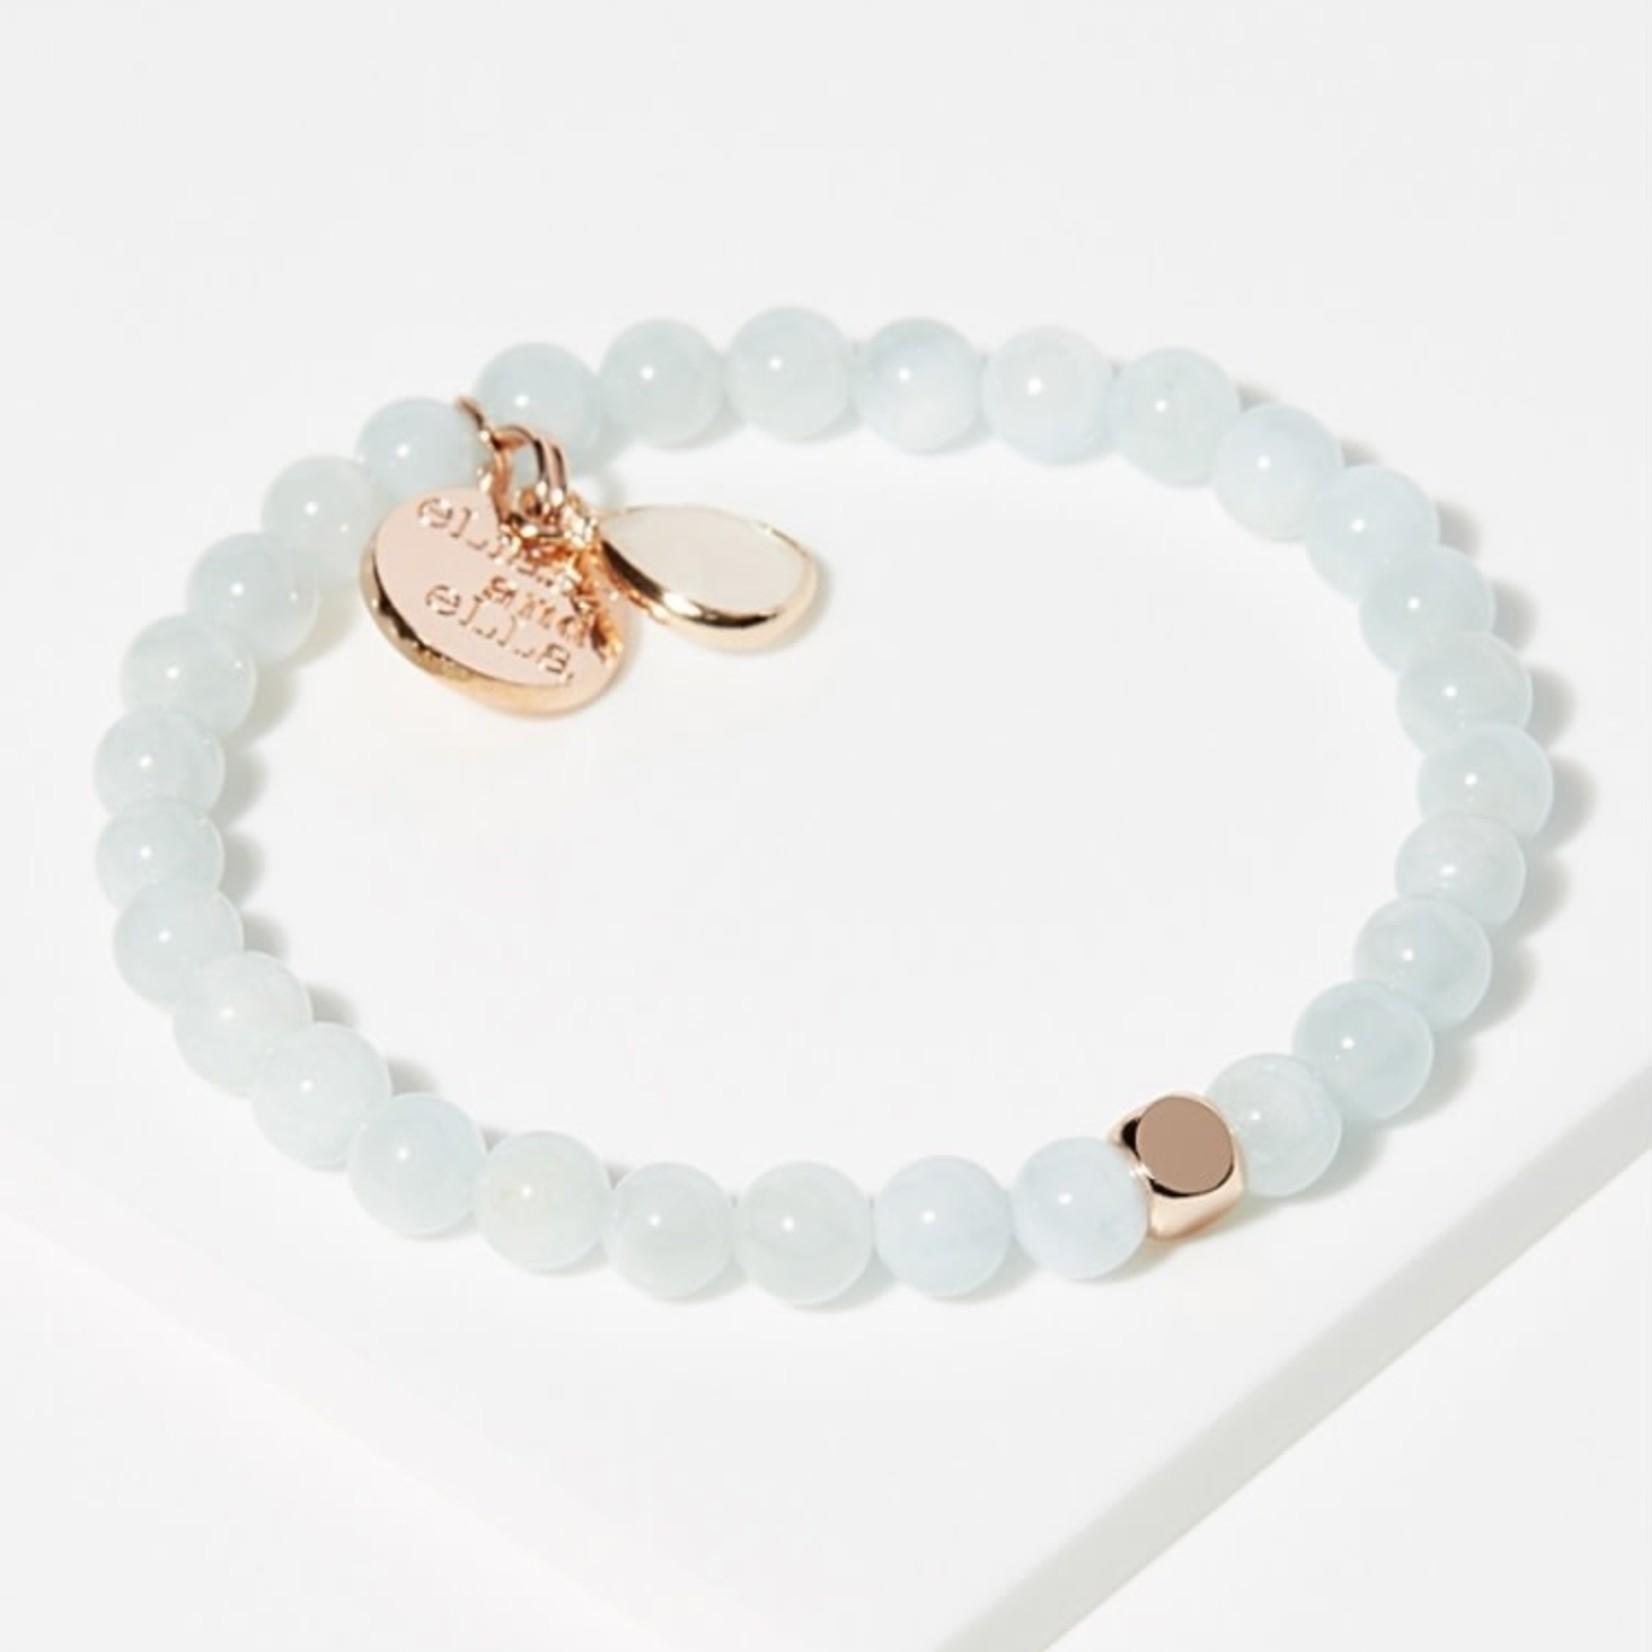 eliasz and ella Mini Stone Bangin' Bracelet